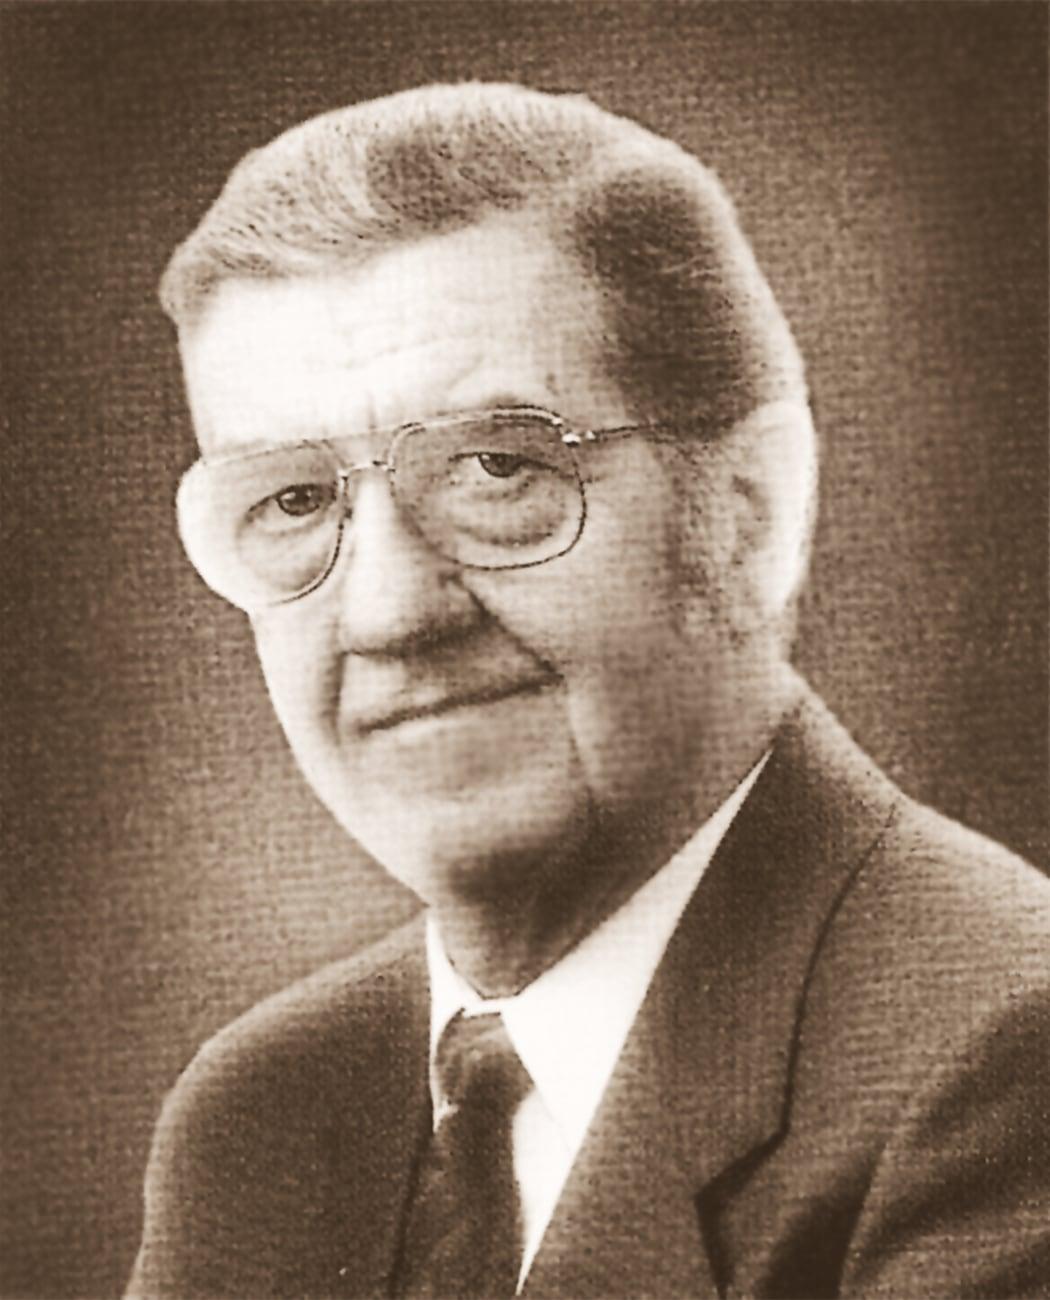 Erich Knollenborg